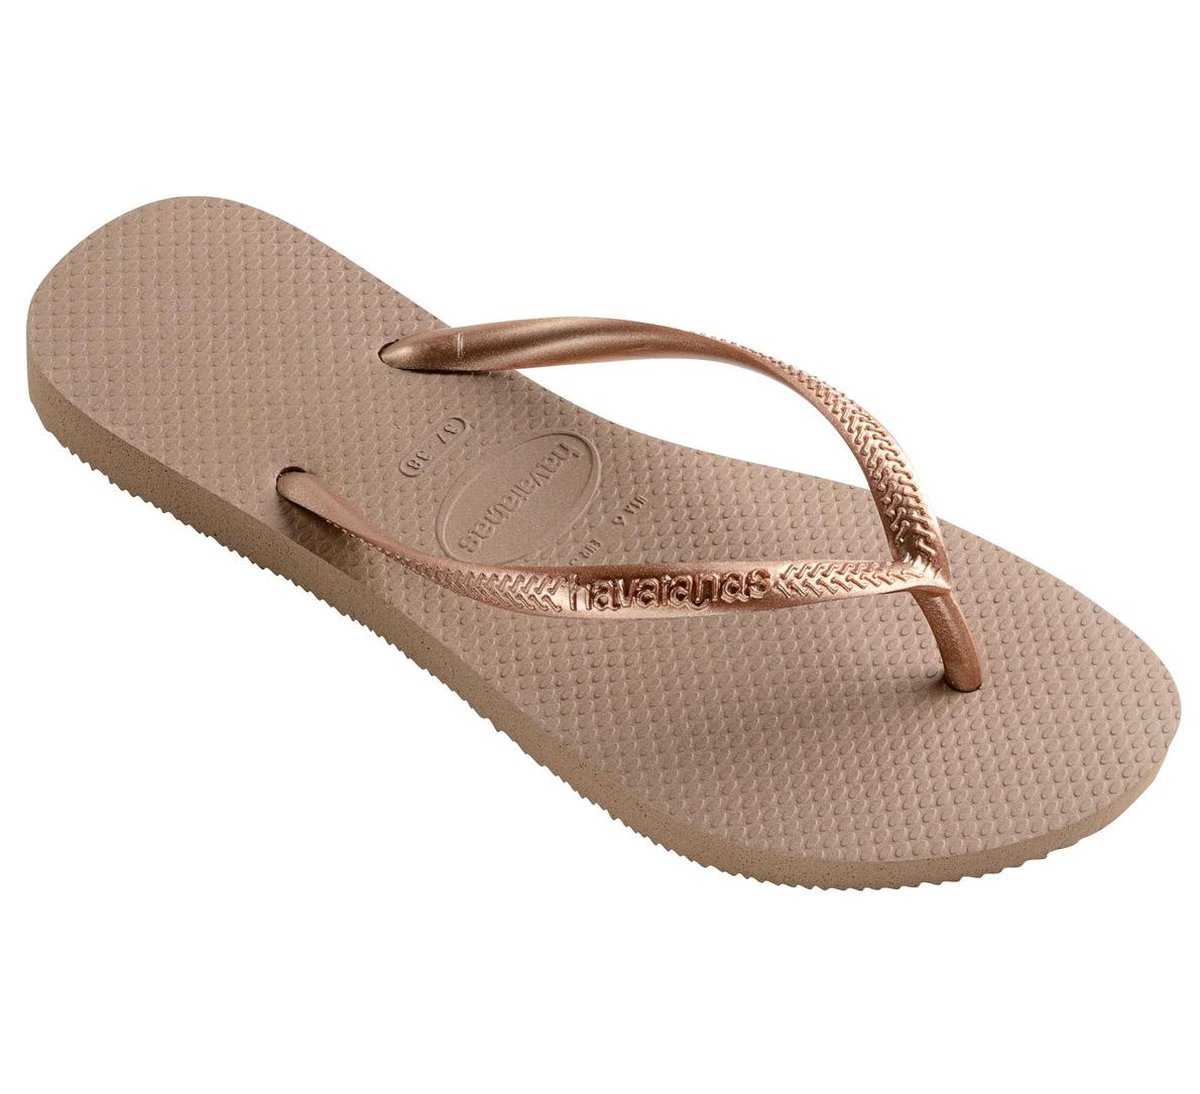 Havaianas Slim Dames Slippers - Rose Gold - Maat 41/42